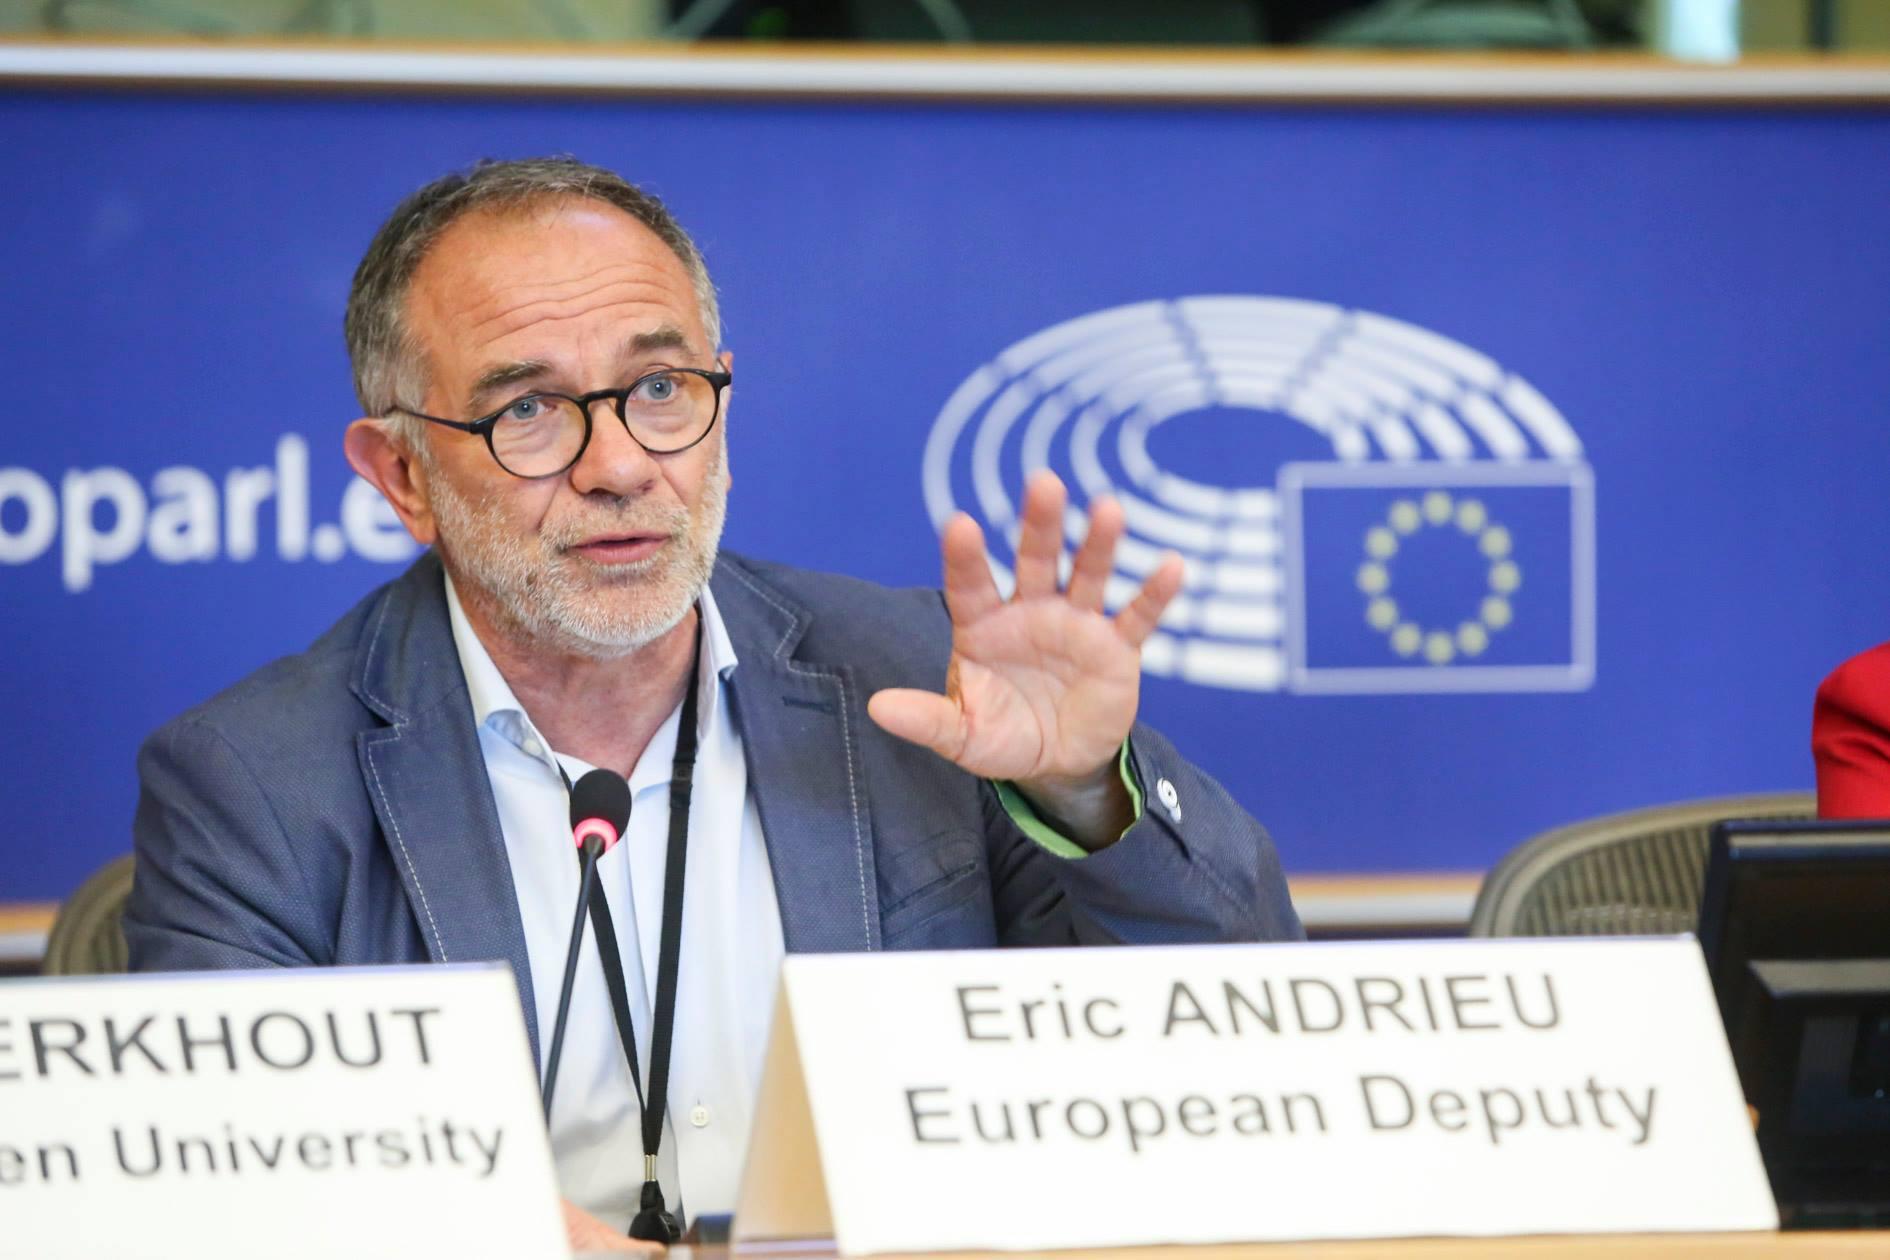 http://www.eric-andrieu.eu/wp-content/uploads/2017/07/EAgro.jpg